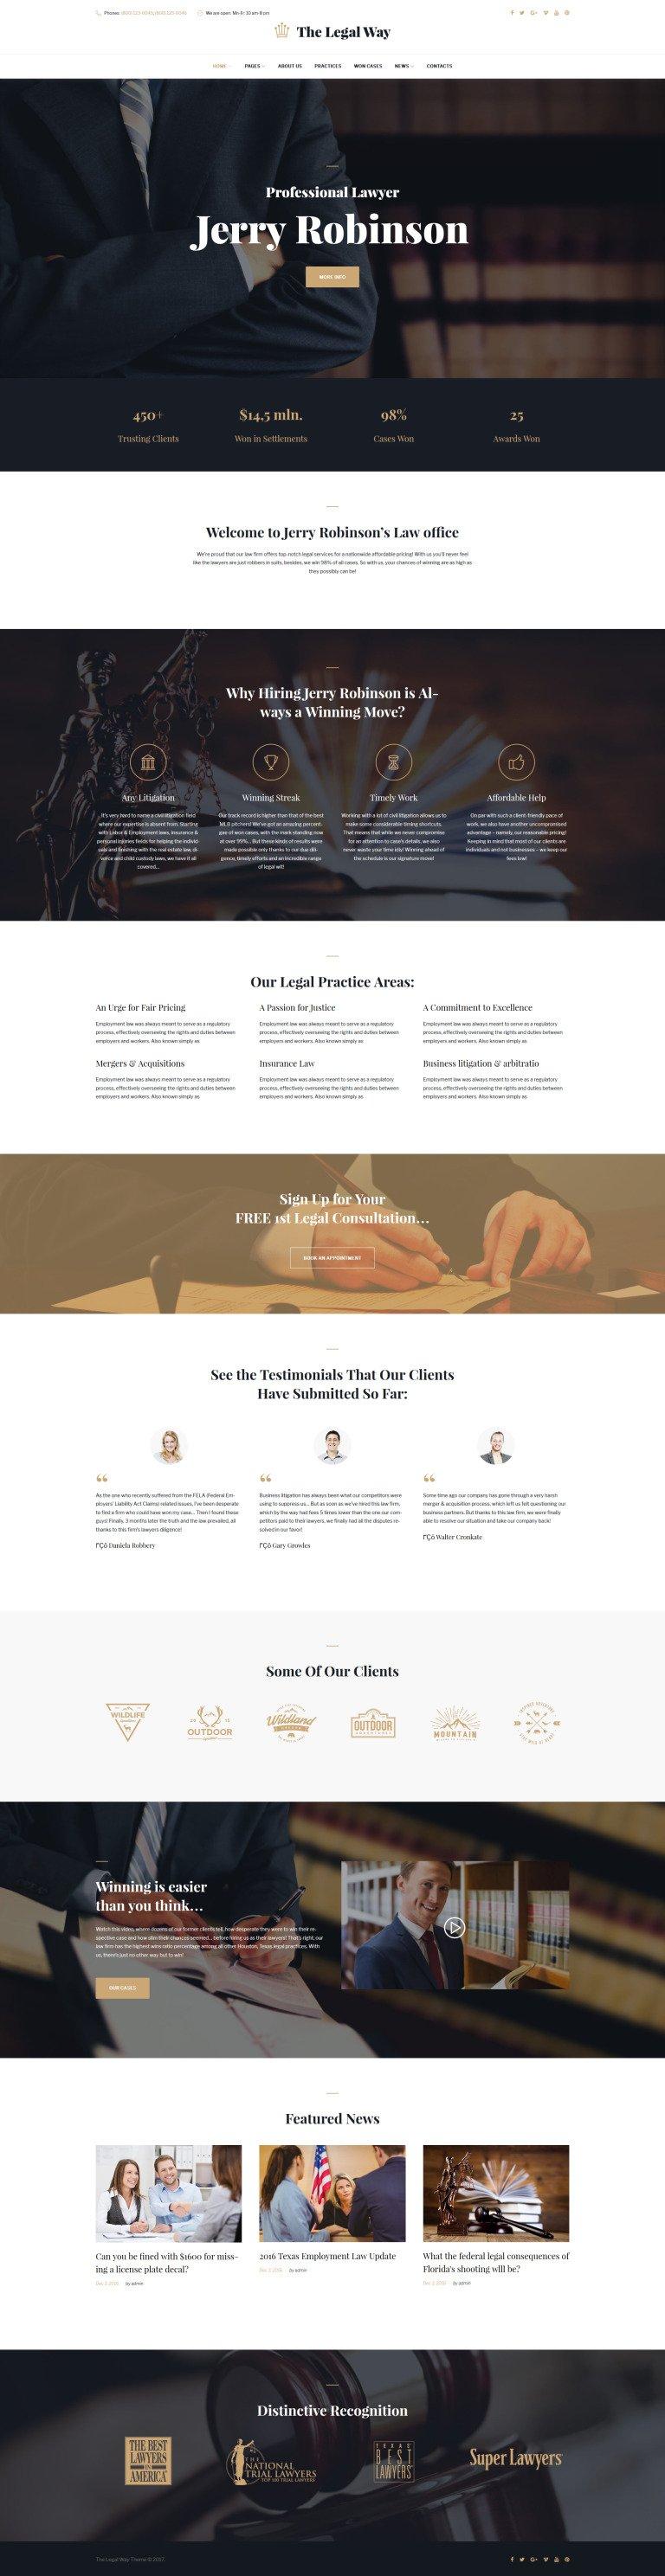 The Legal Way - Lawyer & Attorney WordPress Theme New Screenshots BIG